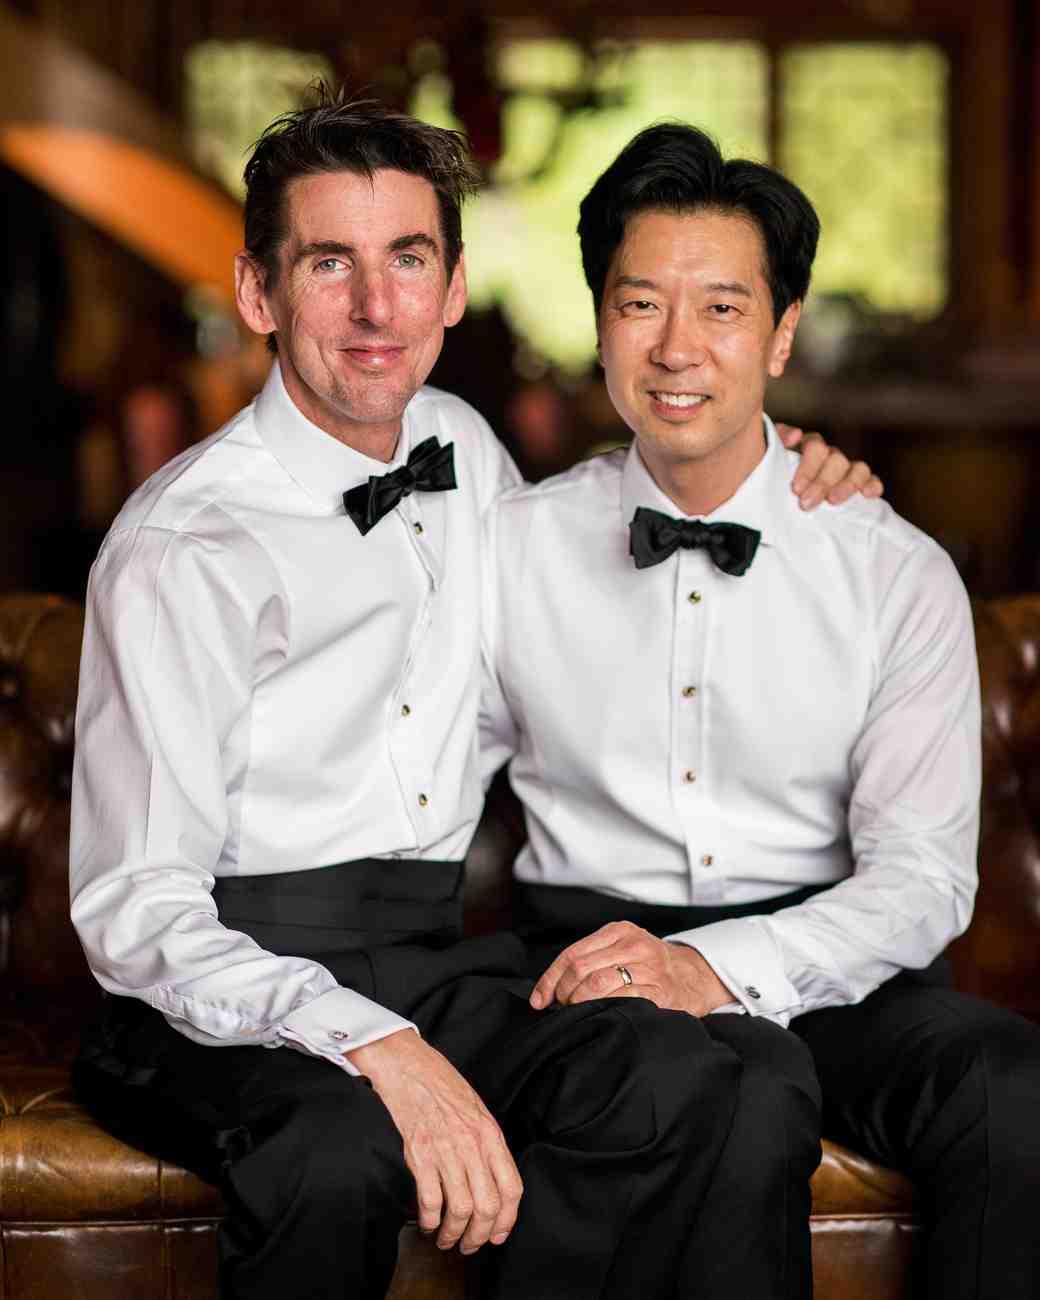 christopher-stephen-wedding-grooms-0125-s112787-0416.jpg